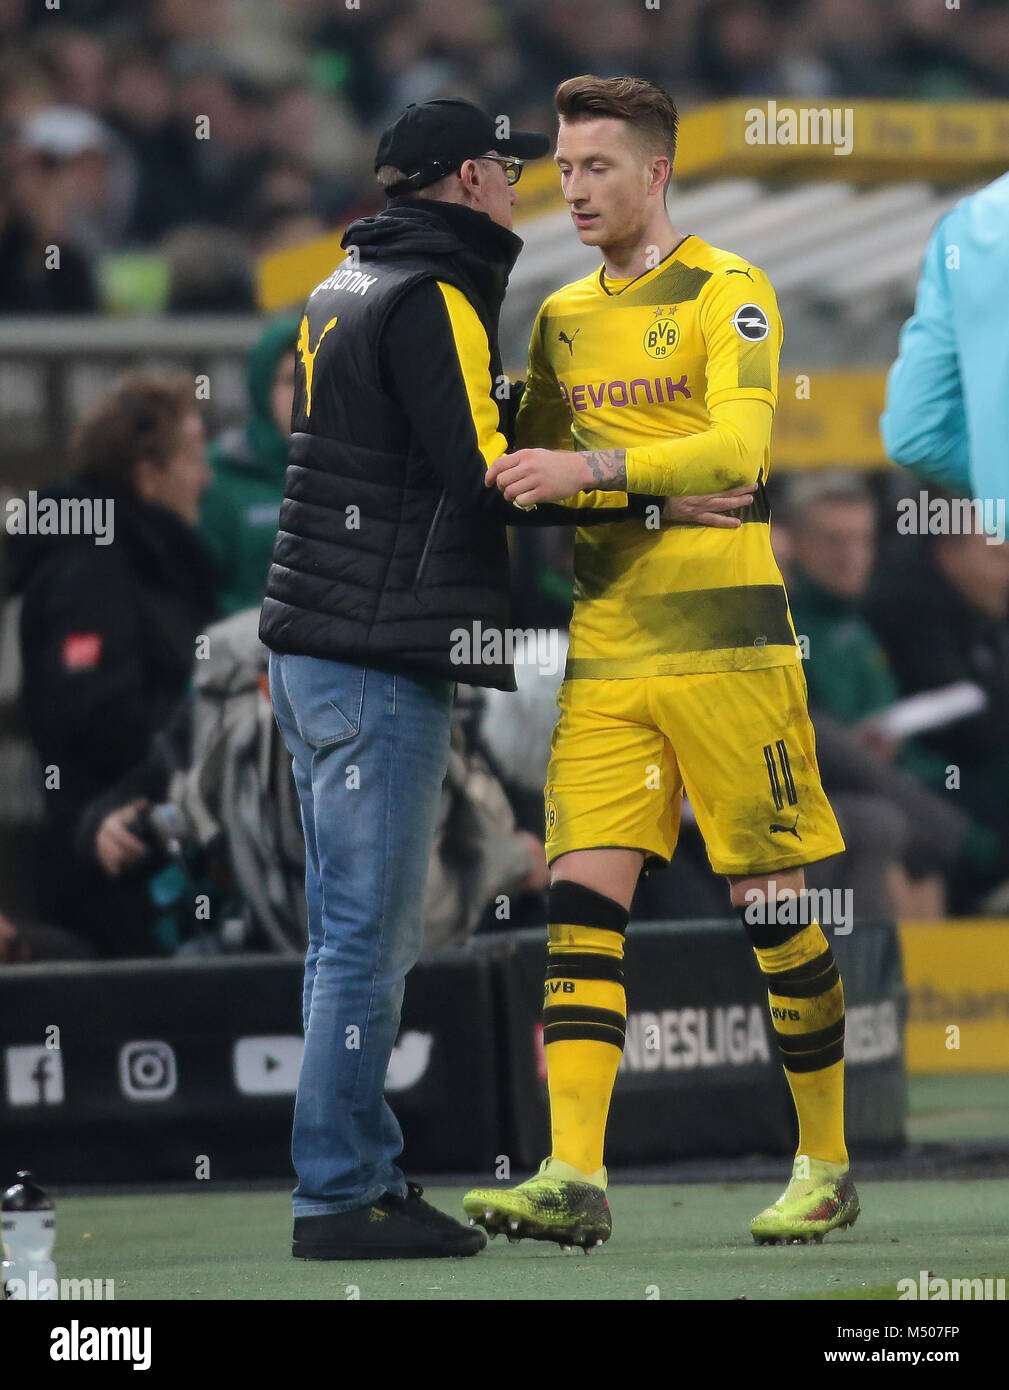 Moenchengladbach, Germany, Februaray 18 2018, Bundesliga matchday 23, Borussia Moenchengladbach vs Borussia Dortmund: - Stock Image